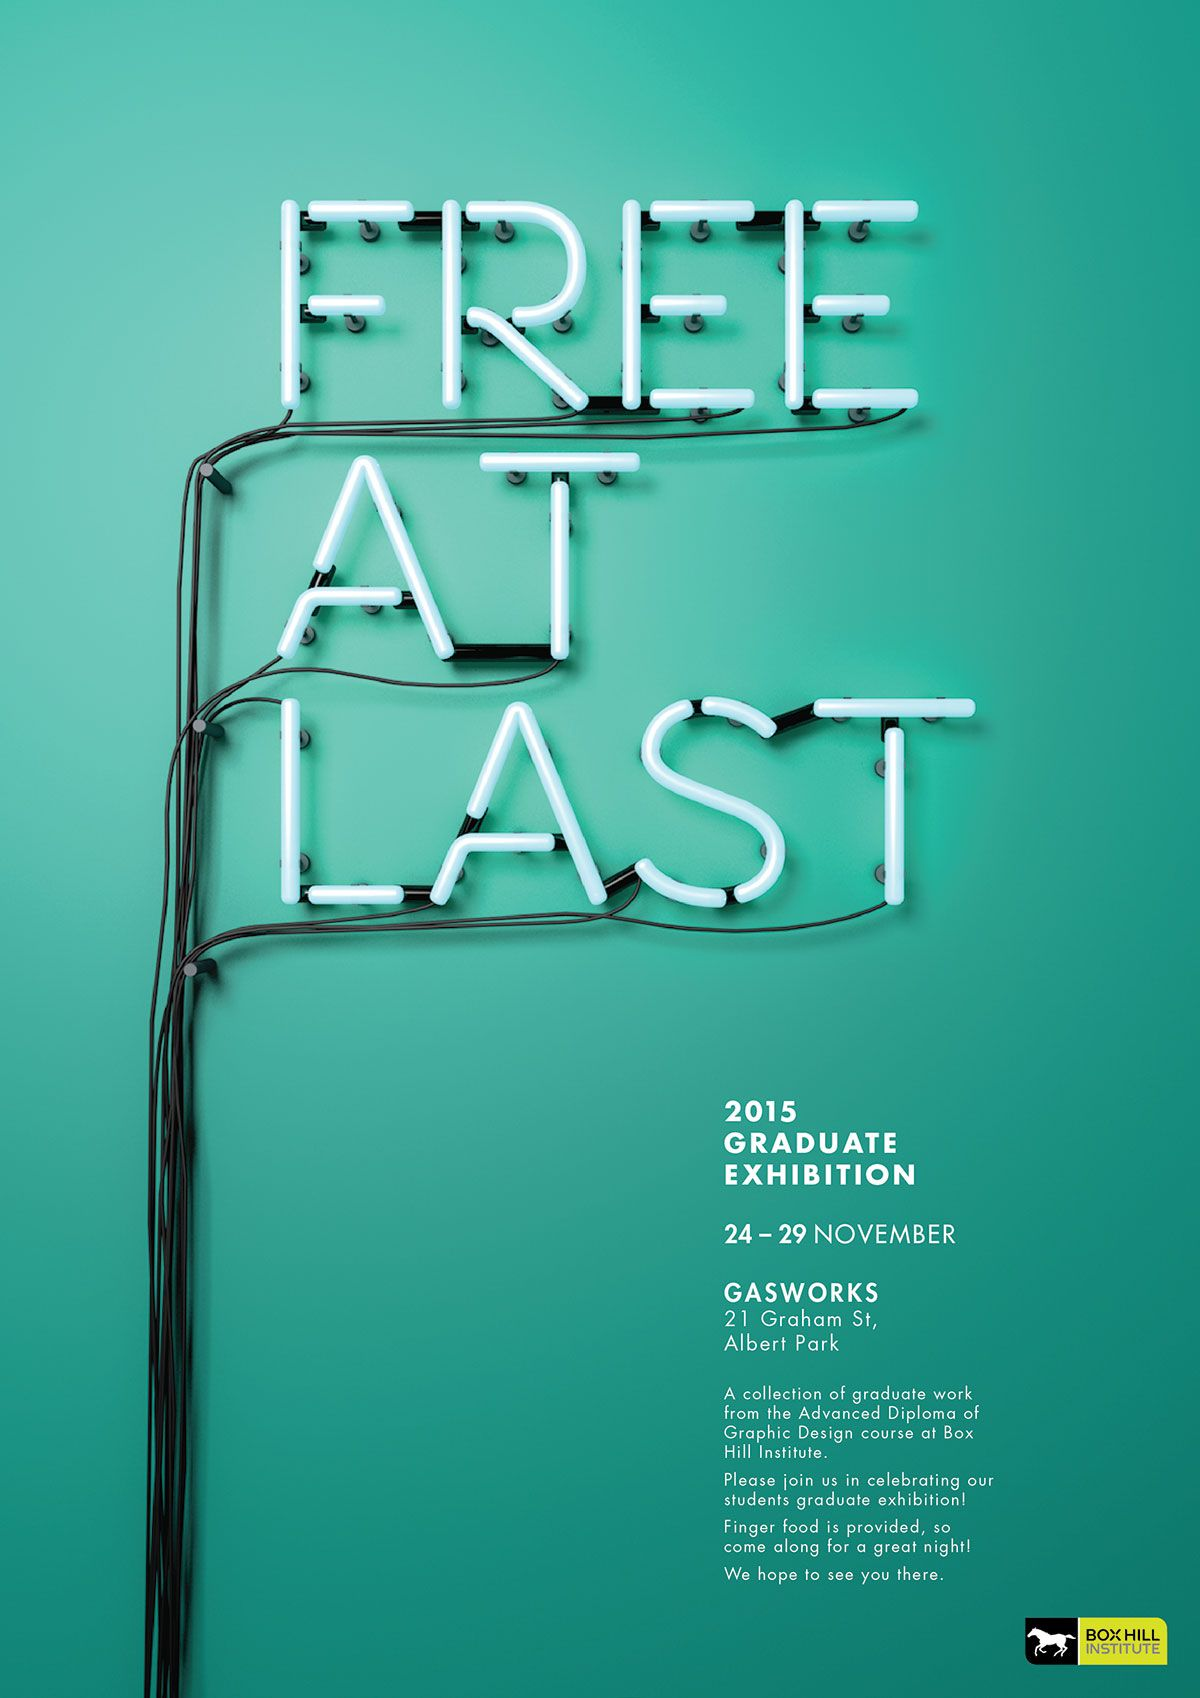 Image Result For Multi Level Front Steps: Image Result For Exhibition Poster